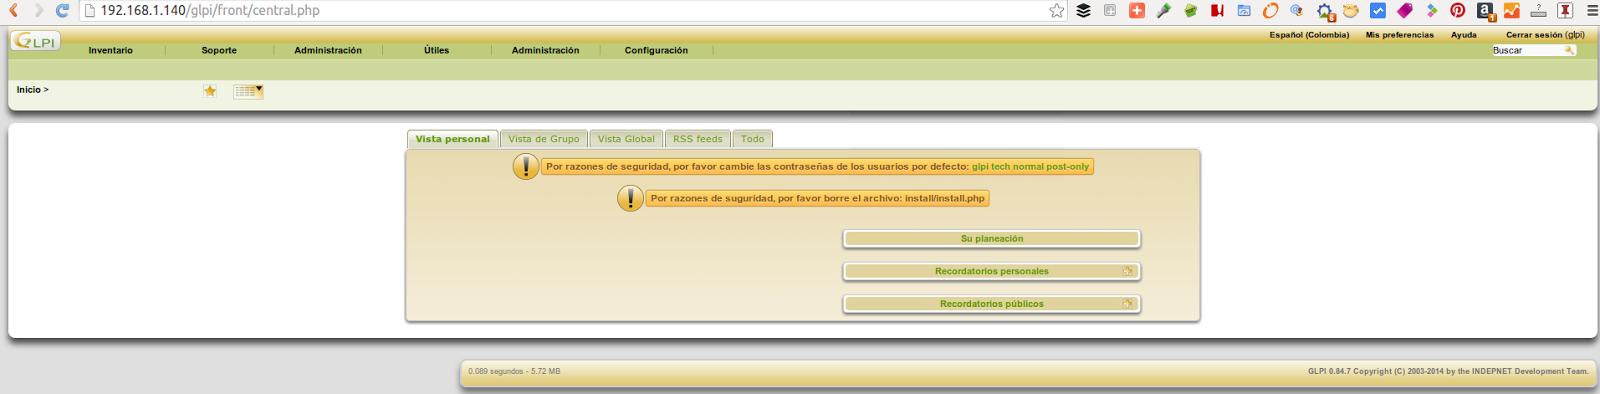 DriveMeca instalando GLPI paso a paso en Linux Centos 7